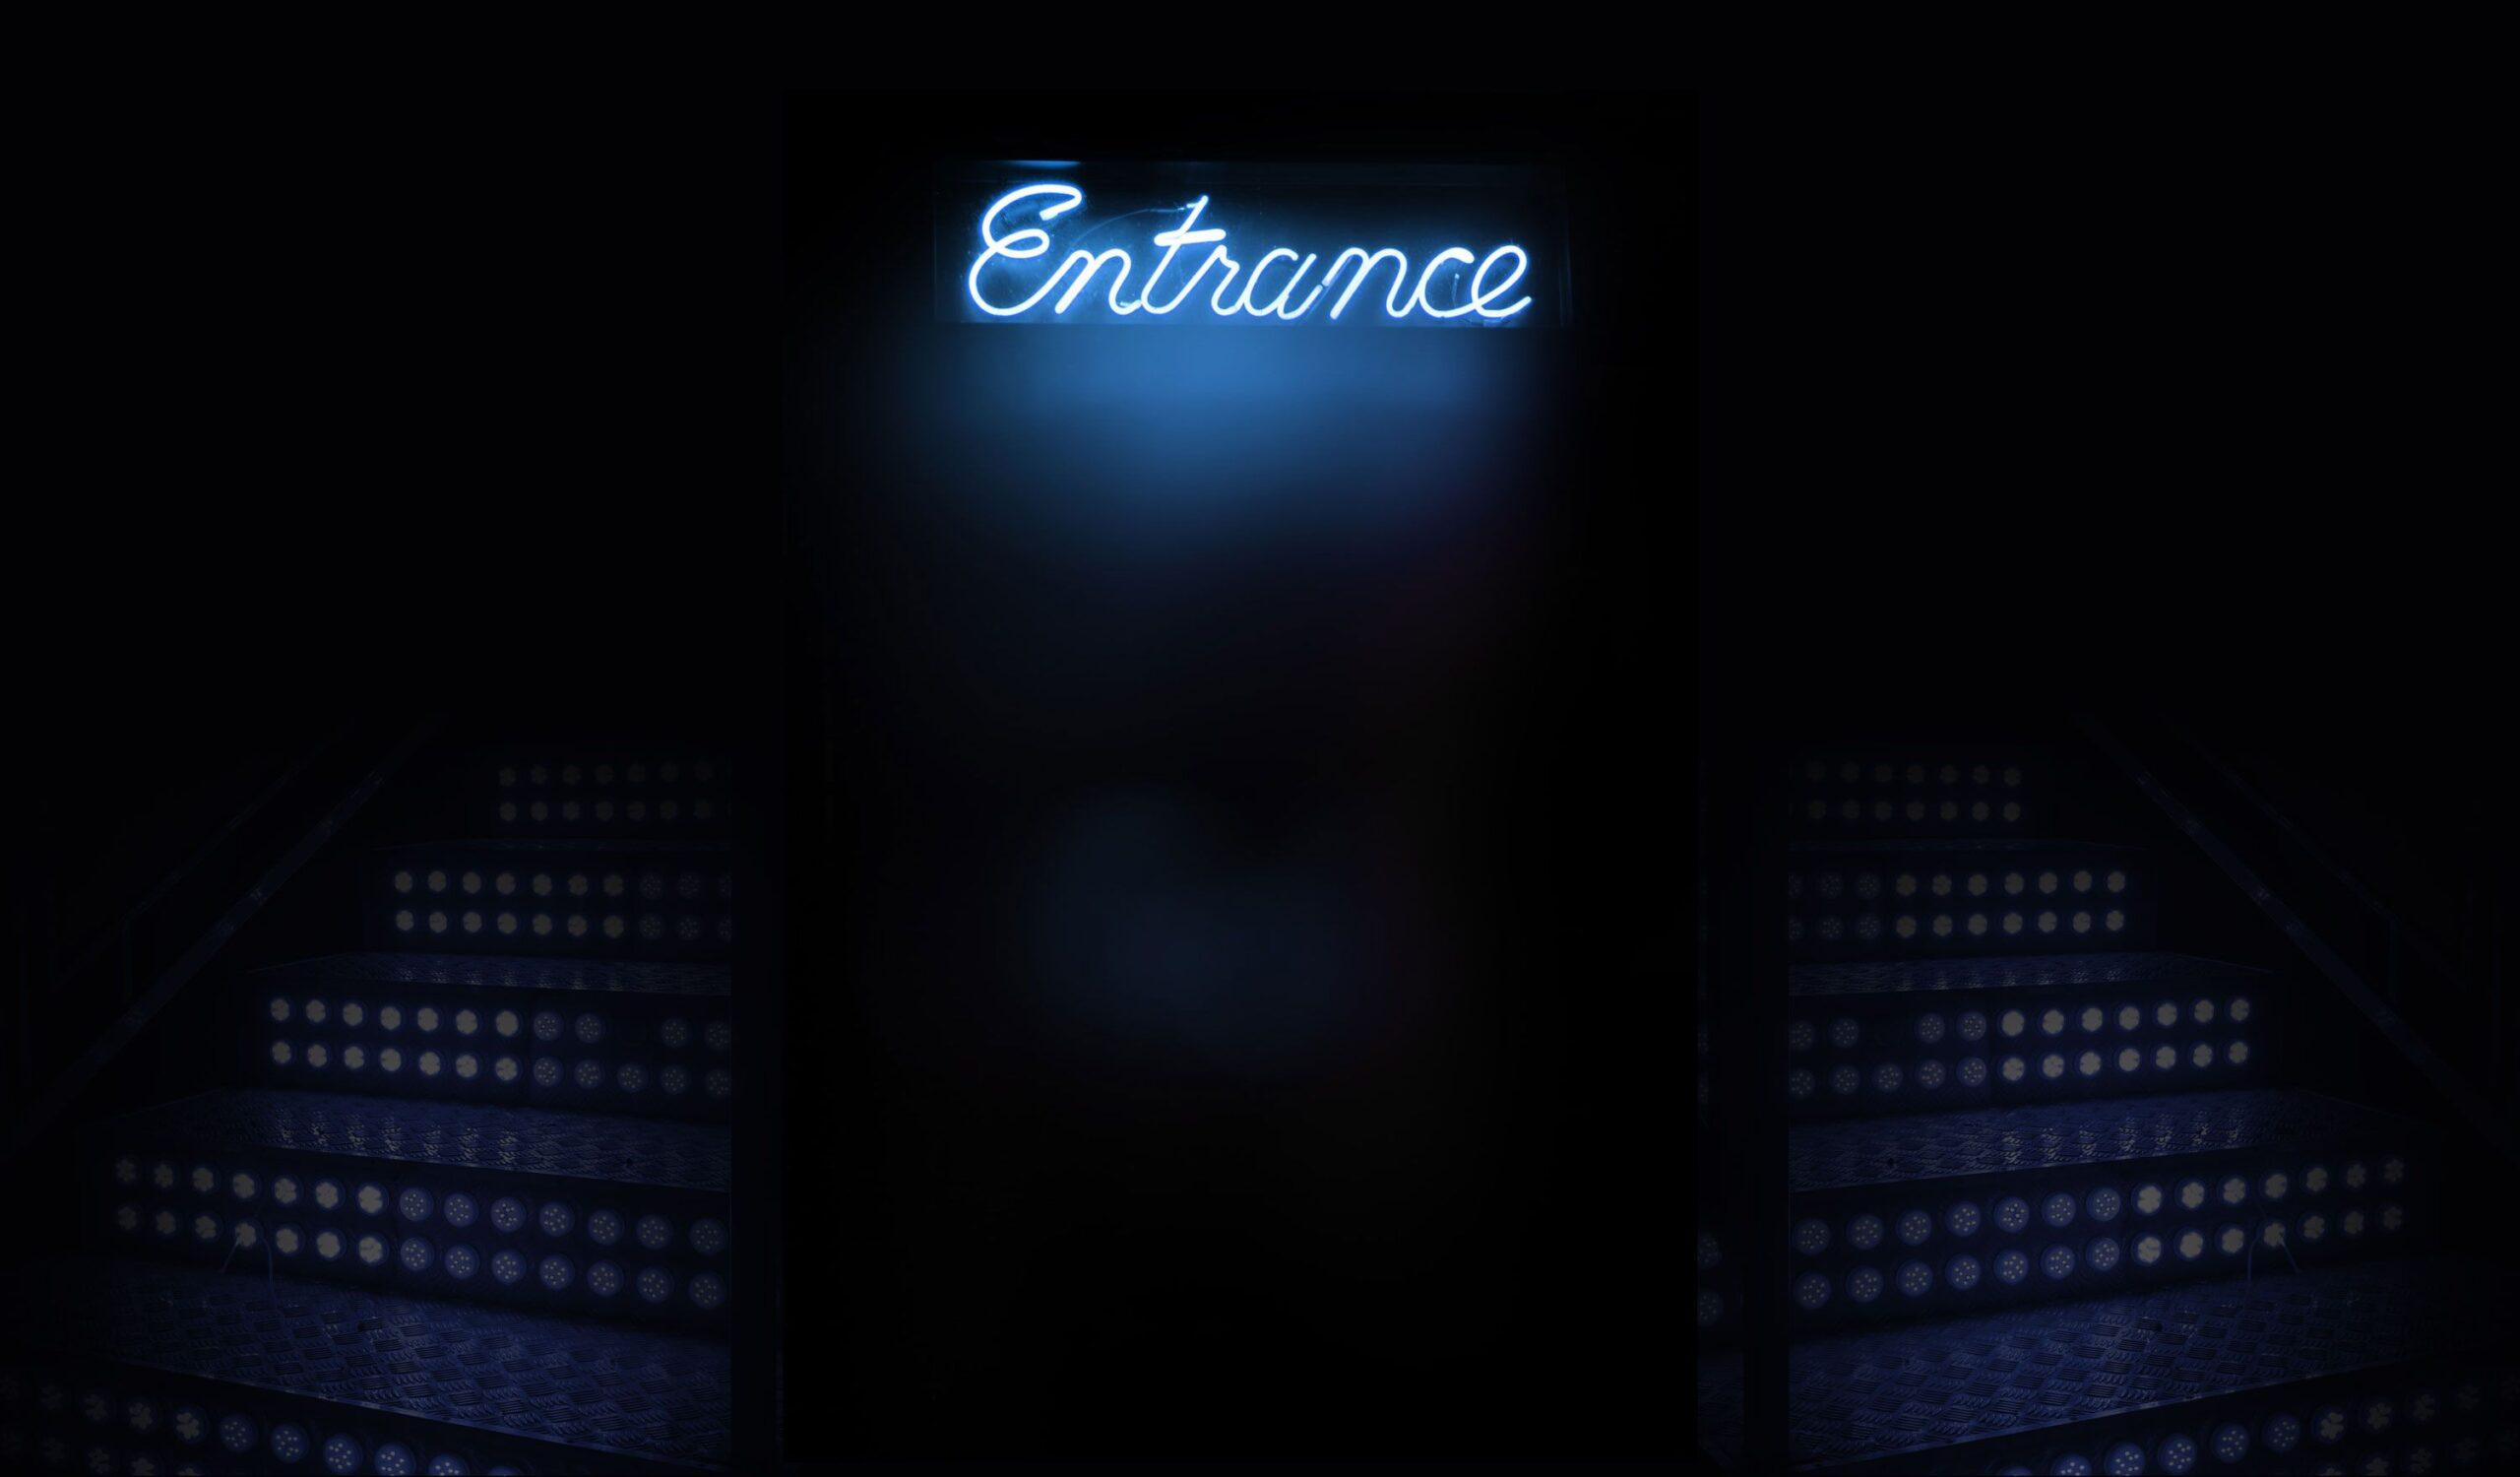 Dance Lounge Entrance